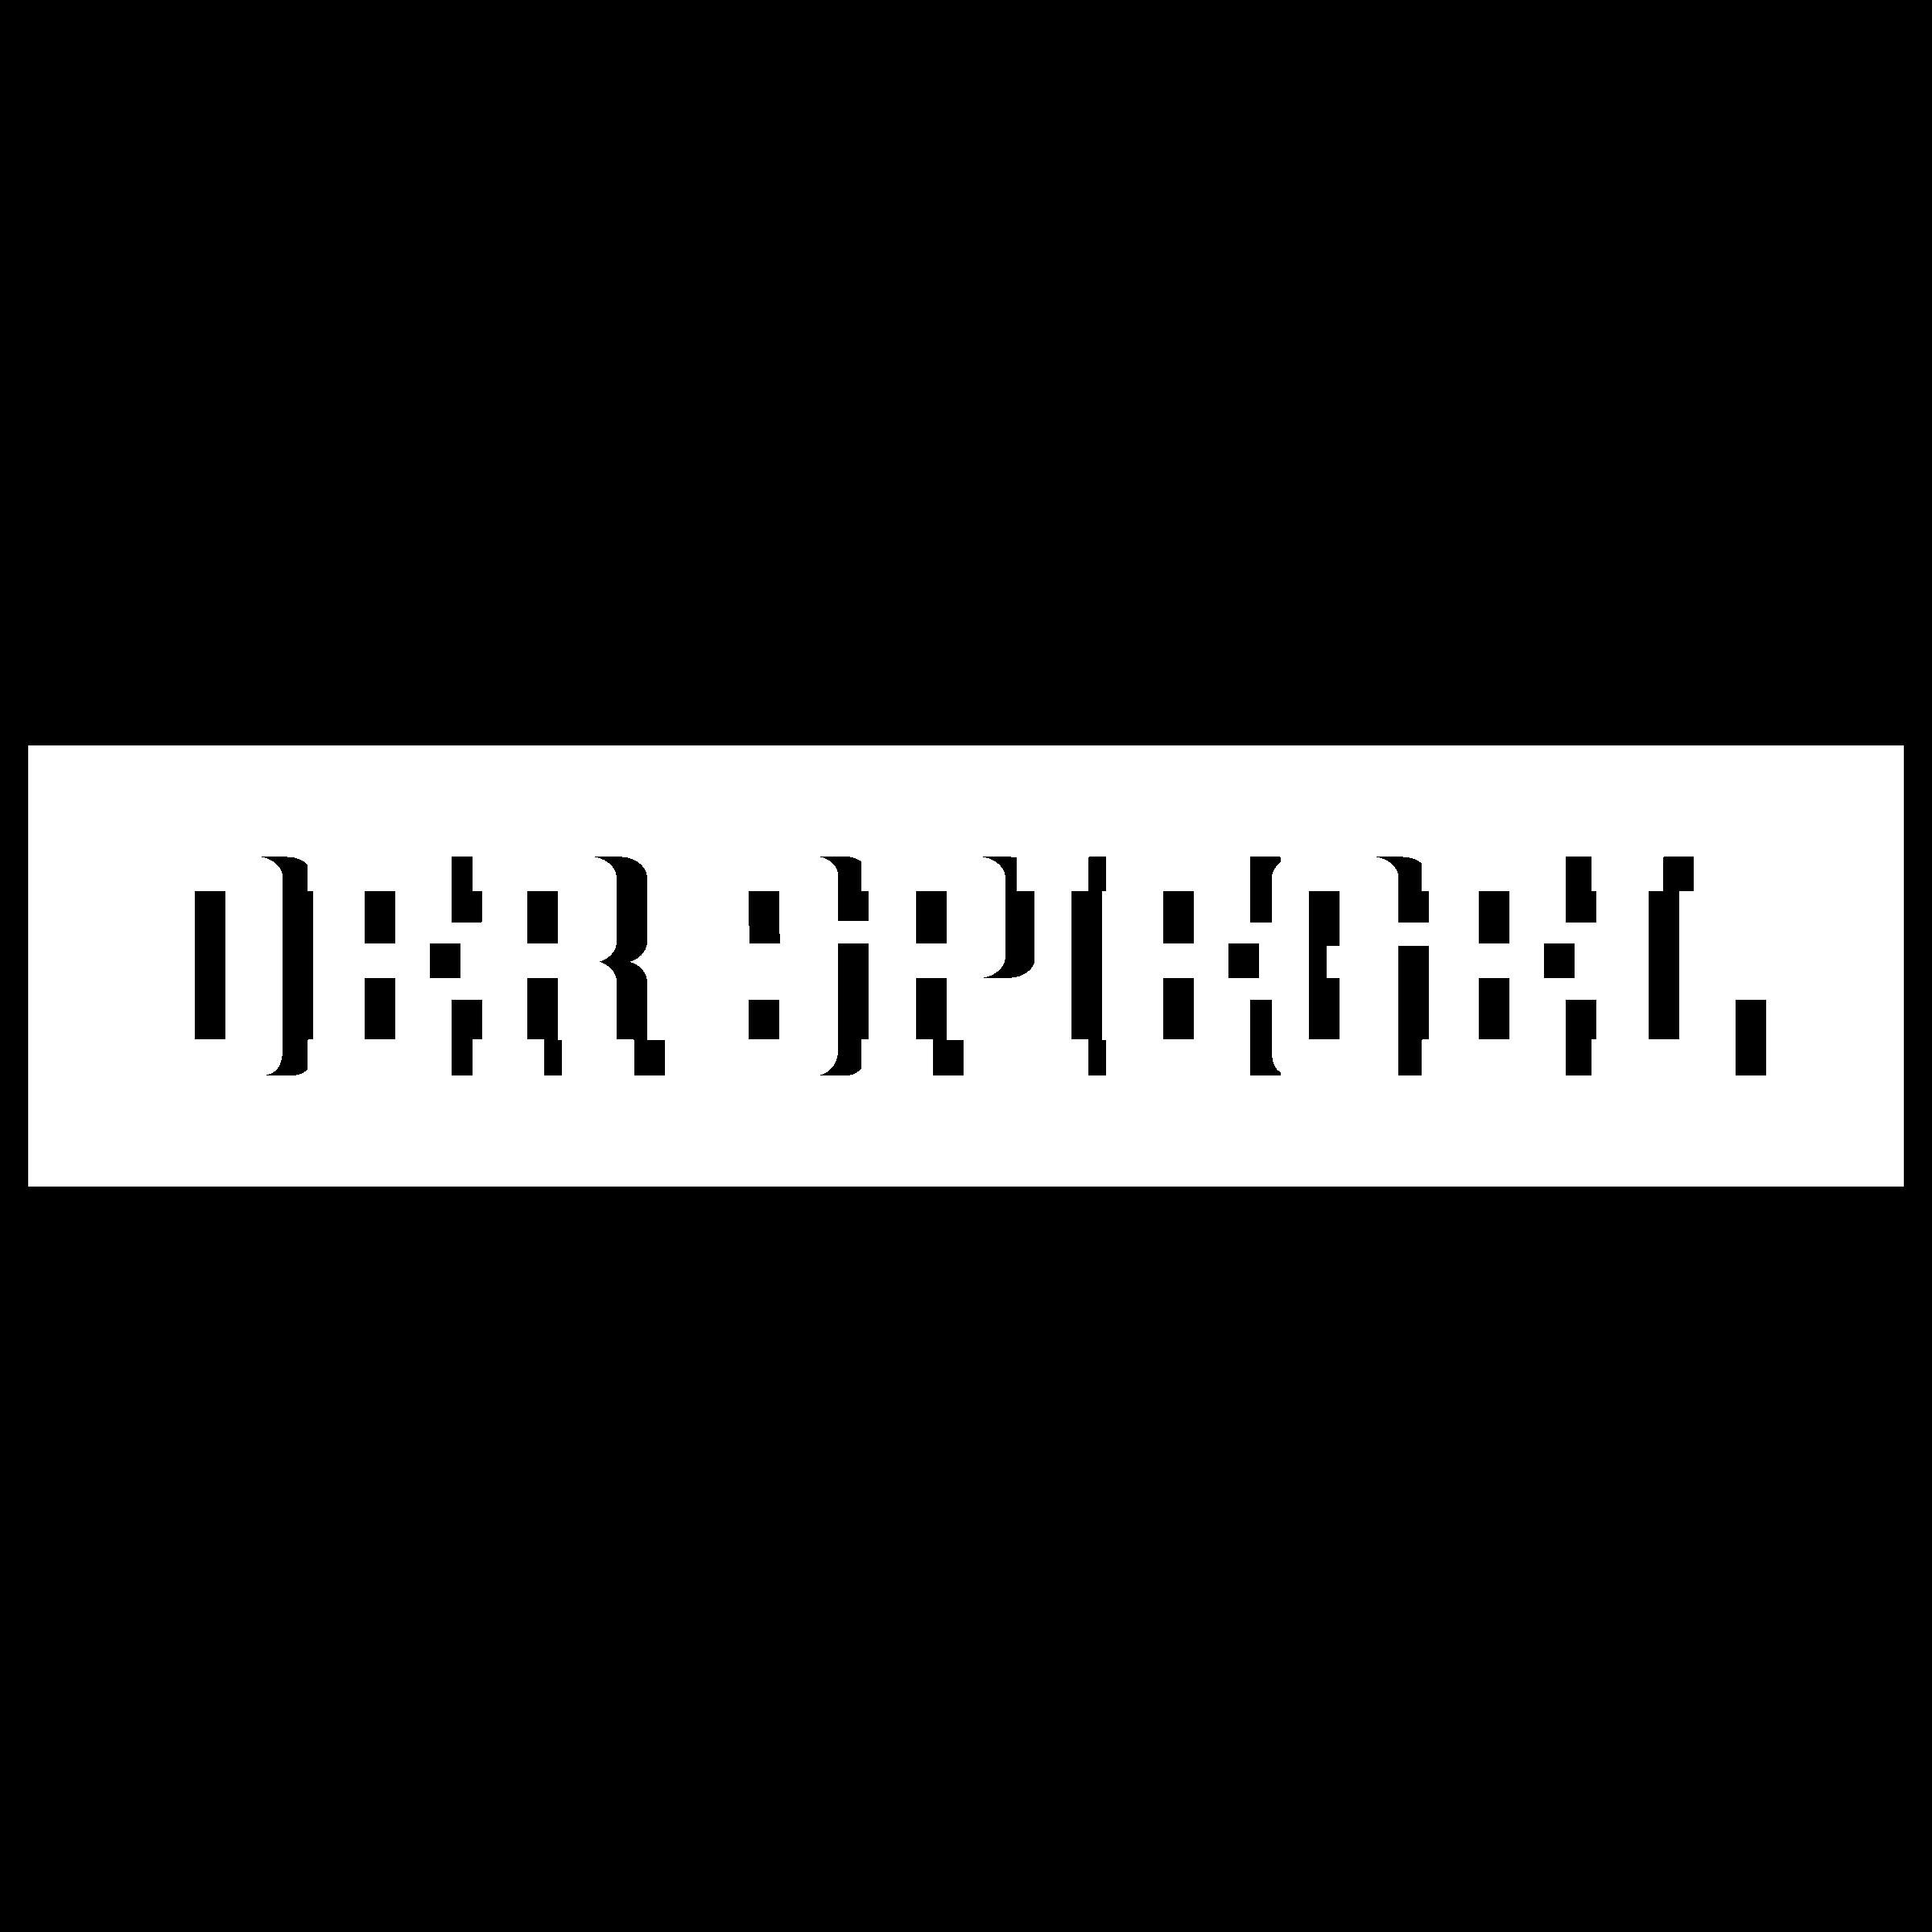 Der Spiegel Logo Png Transparent Svg Vector Freebie Supply